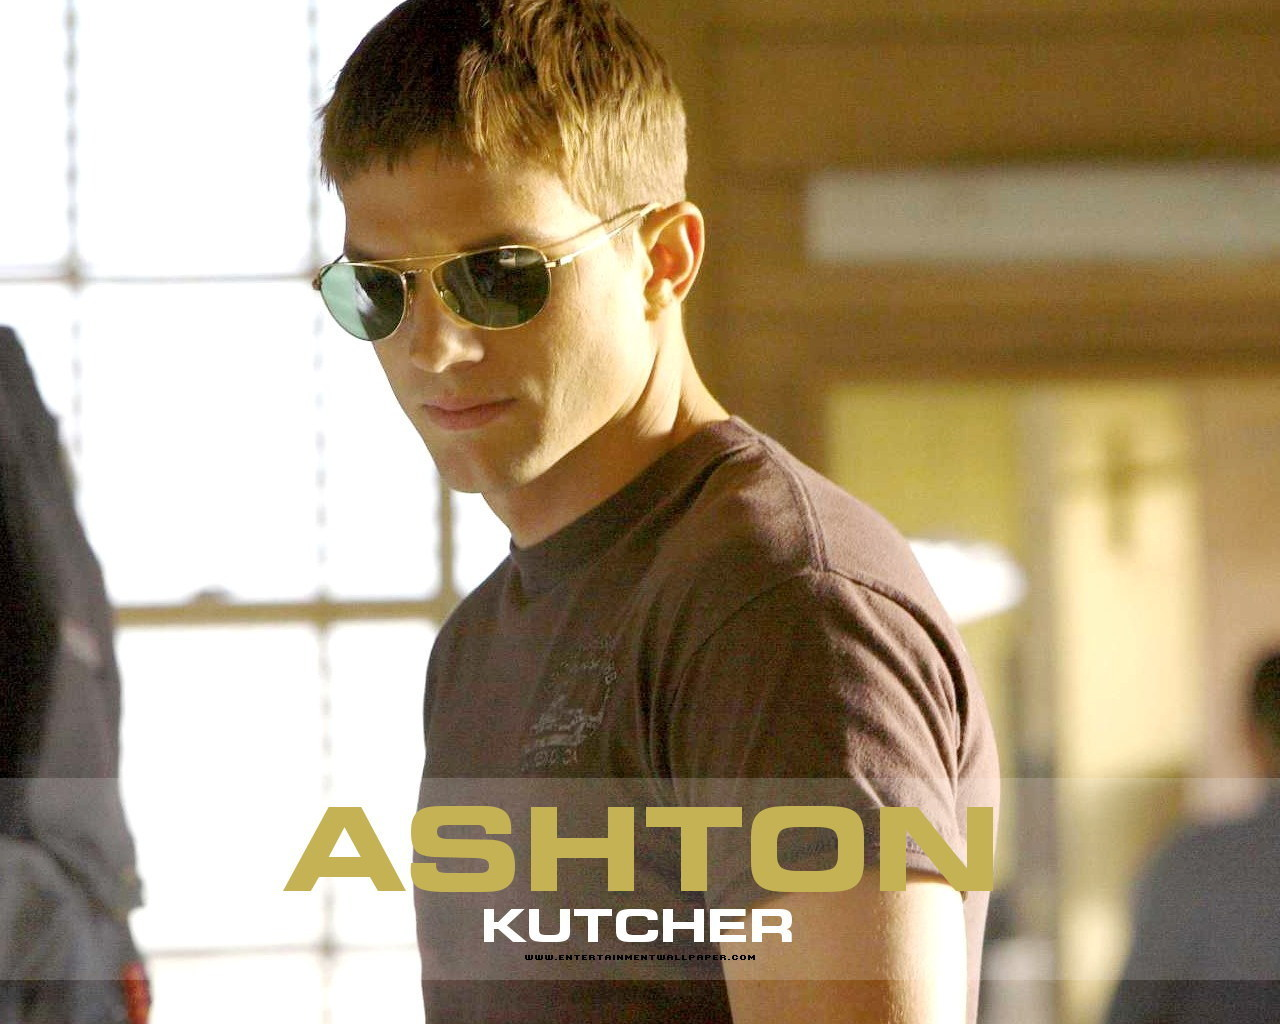 http://3.bp.blogspot.com/_dRwDJbOL9k4/SwwnvvAOFTI/AAAAAAAAB_8/somxRZ_x5Eg/s1600/Ashton-Kutcher%2B(5).jpg